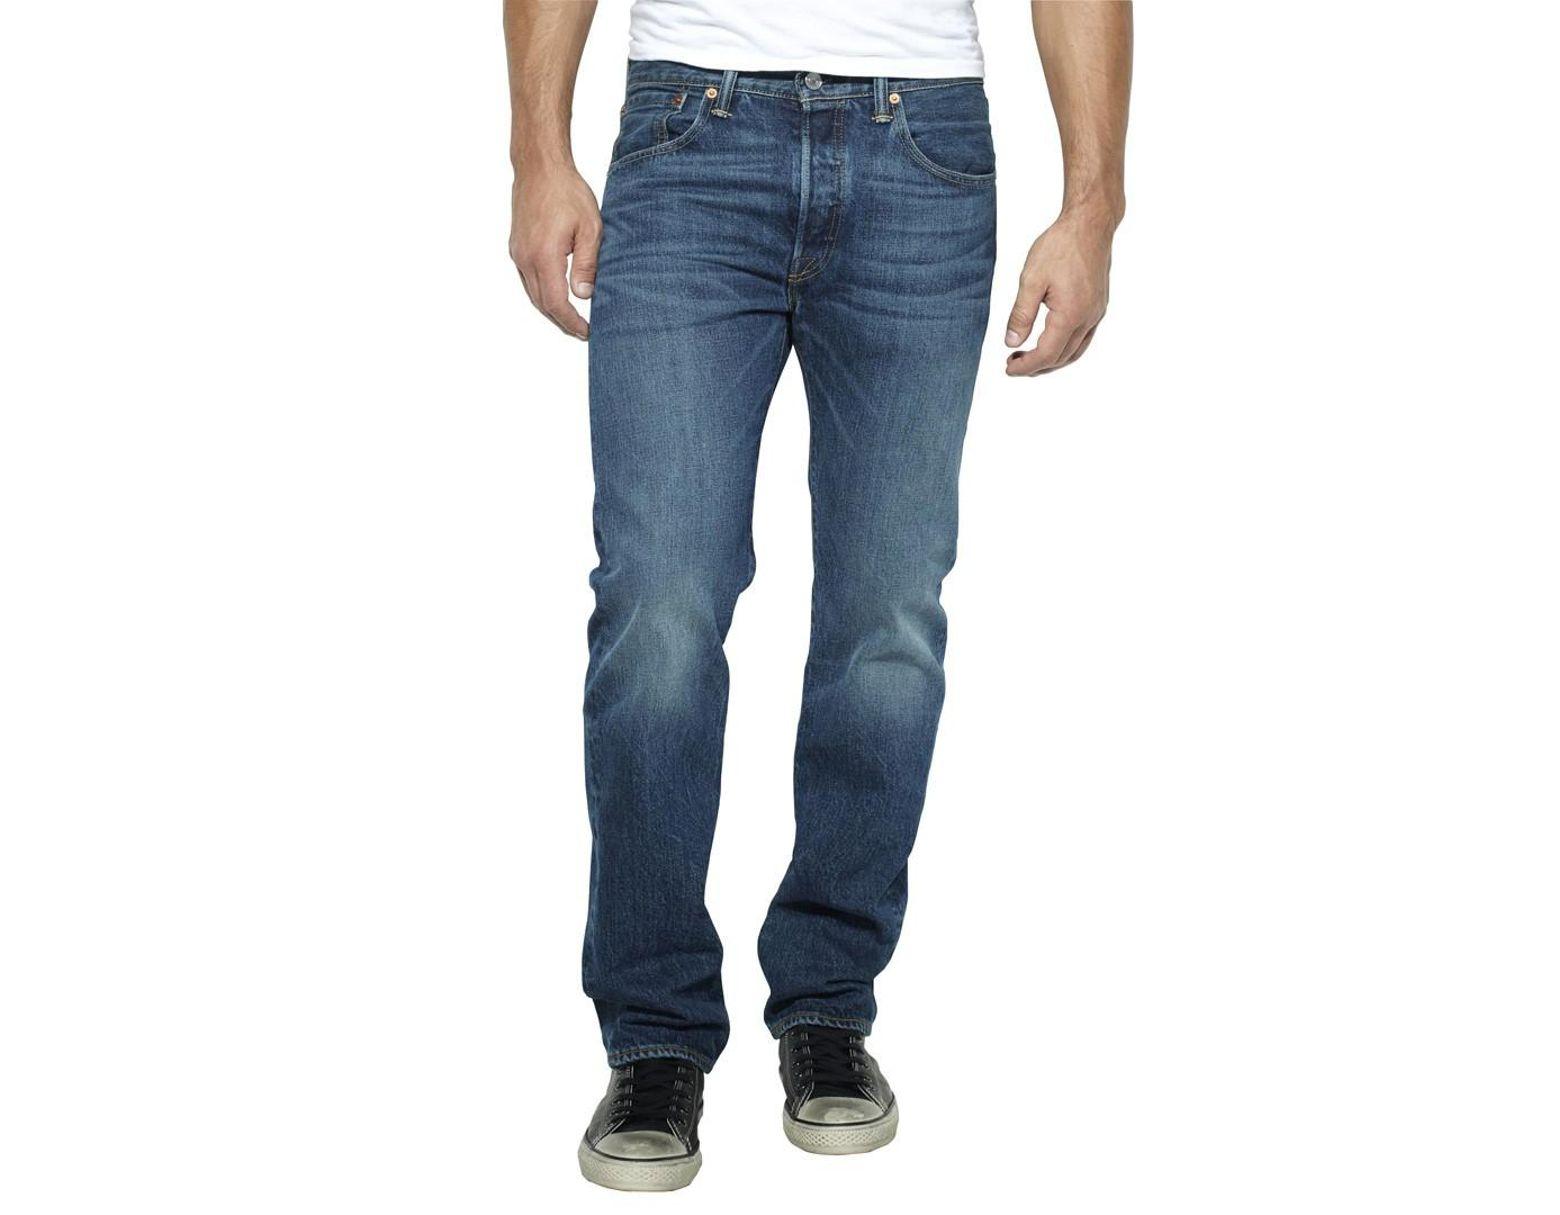 61e9a62d987 Levi's Hook Wash 501 Regular Fit Jeans in Blue for Men - Lyst